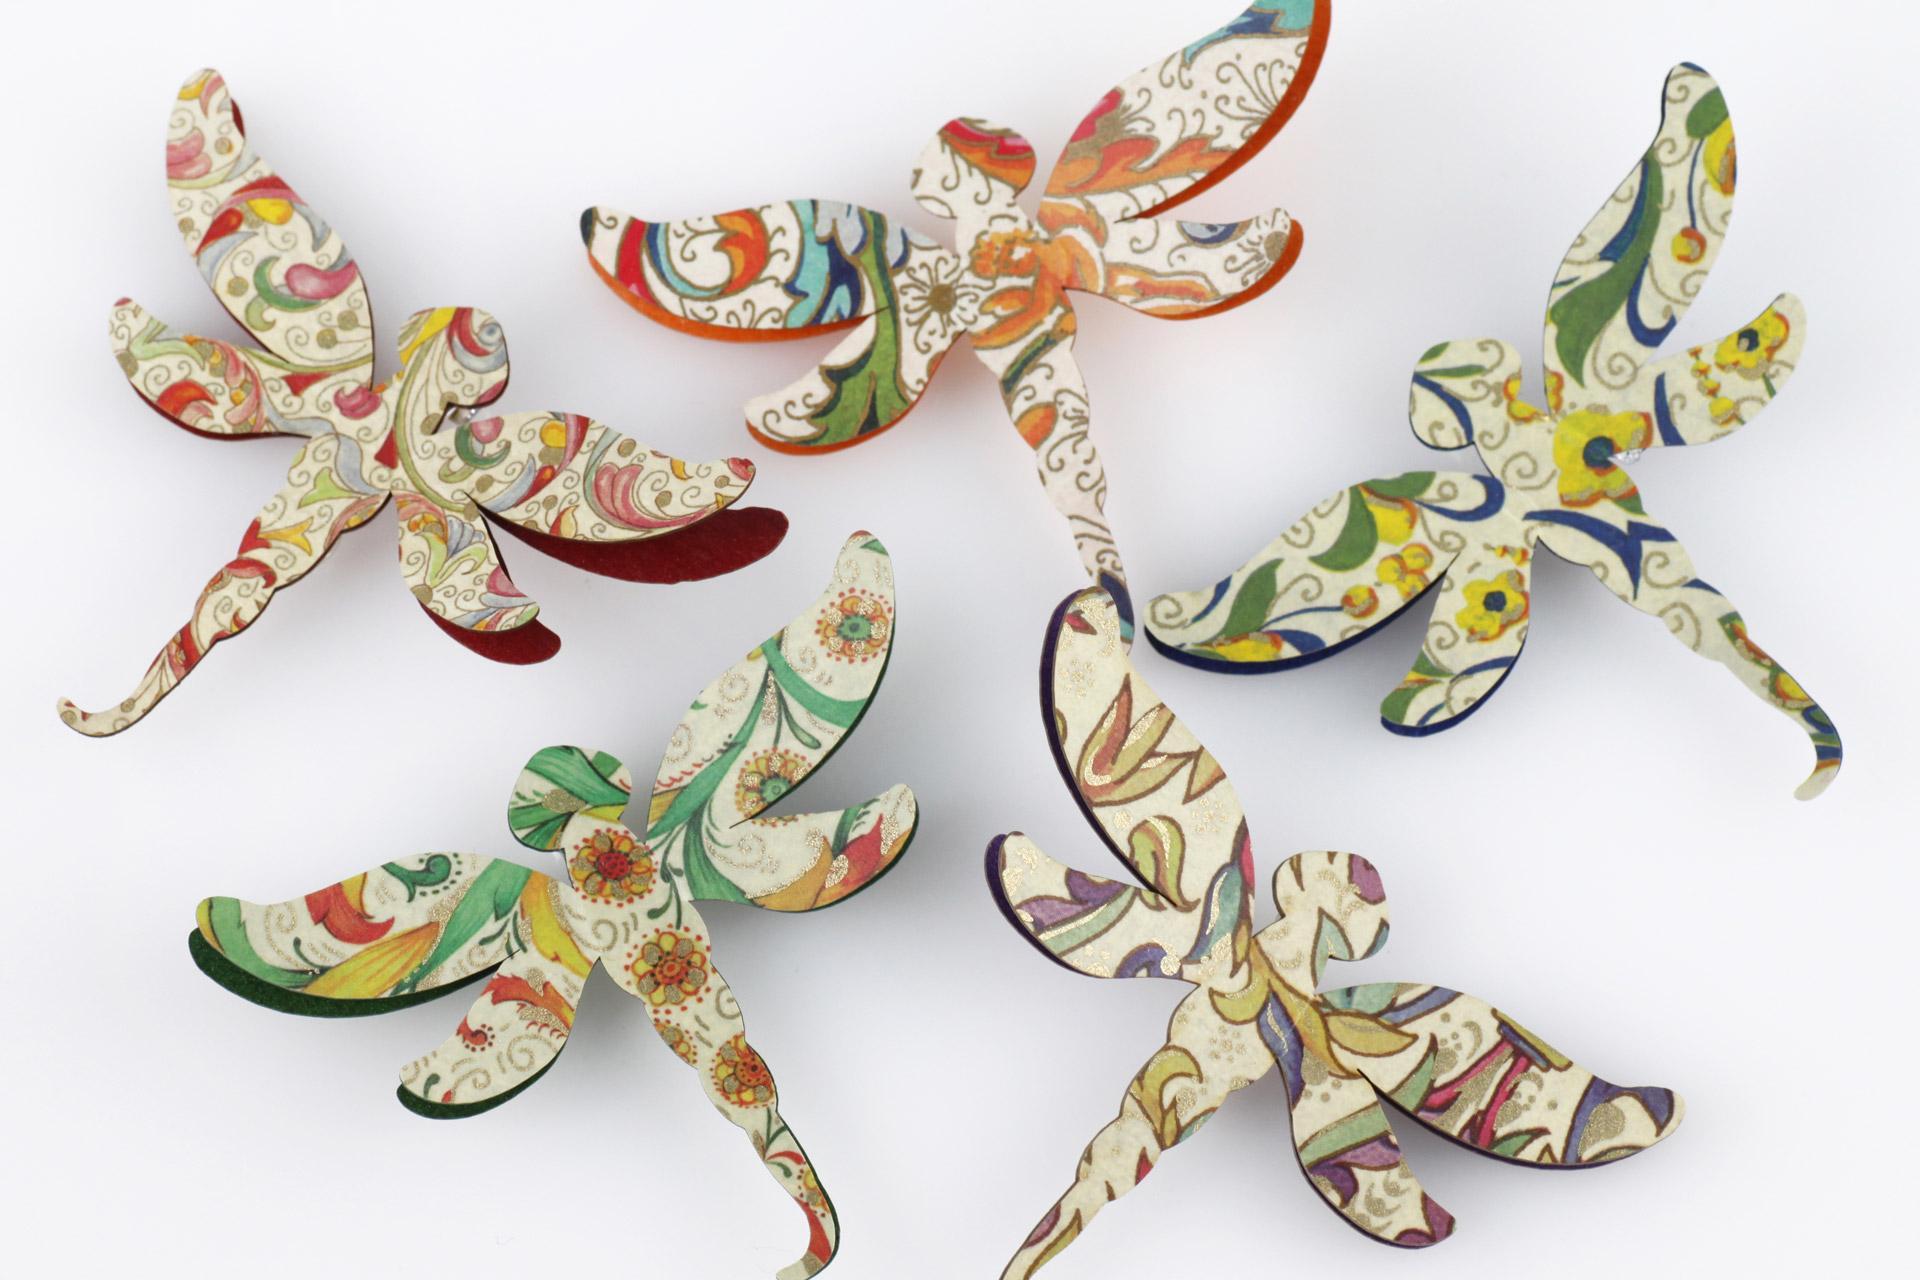 8cf3e1589b23 ... Broches de bisutería de libélulas con bonito estampado en papel